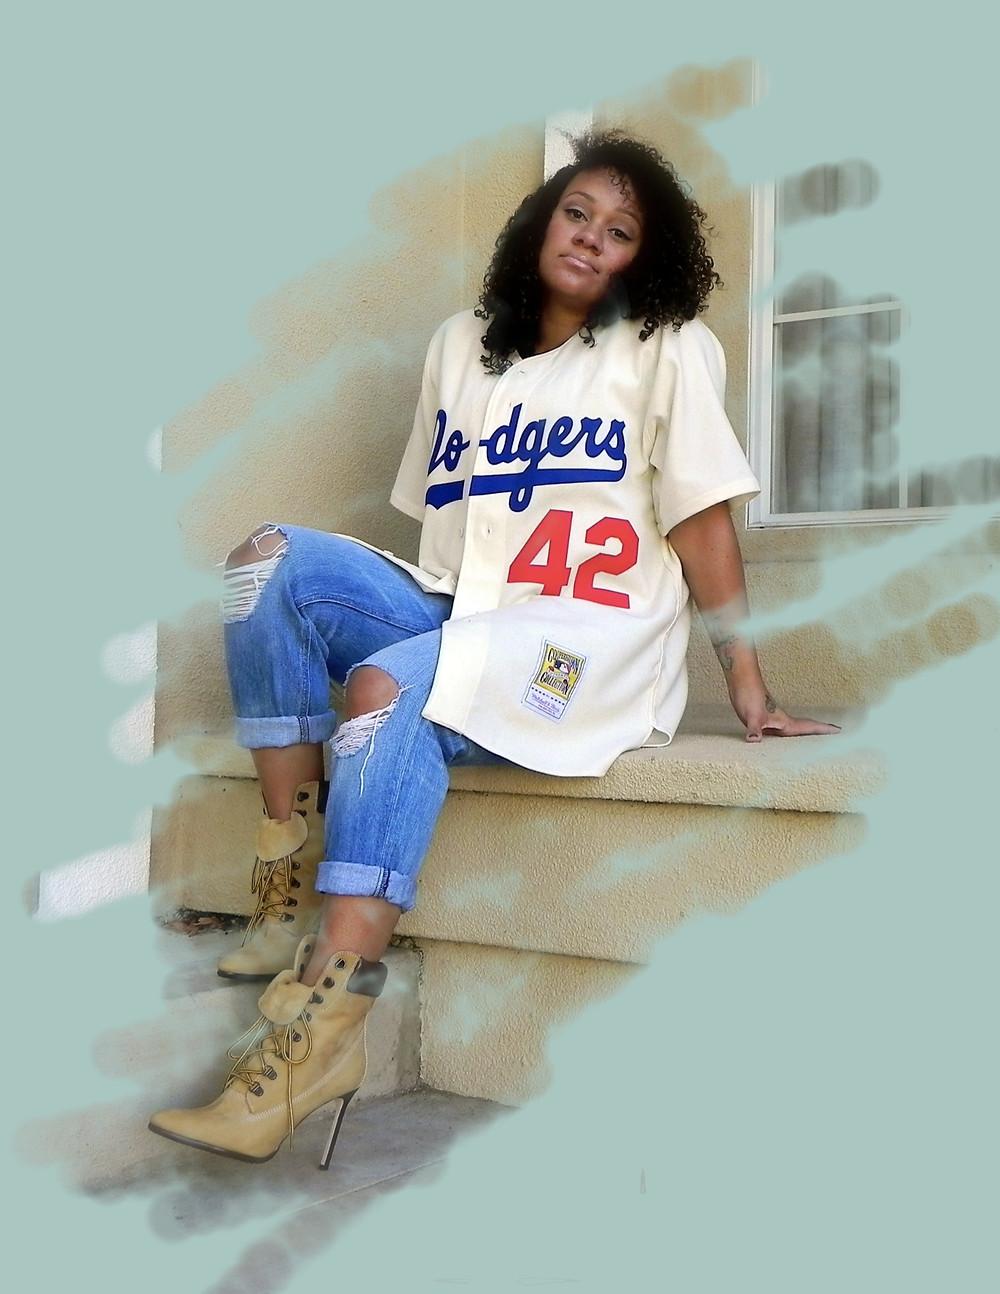 Mitchell & Ness Jackie Robinson Dodgers Jersey, Manolo Blahnik Timbs